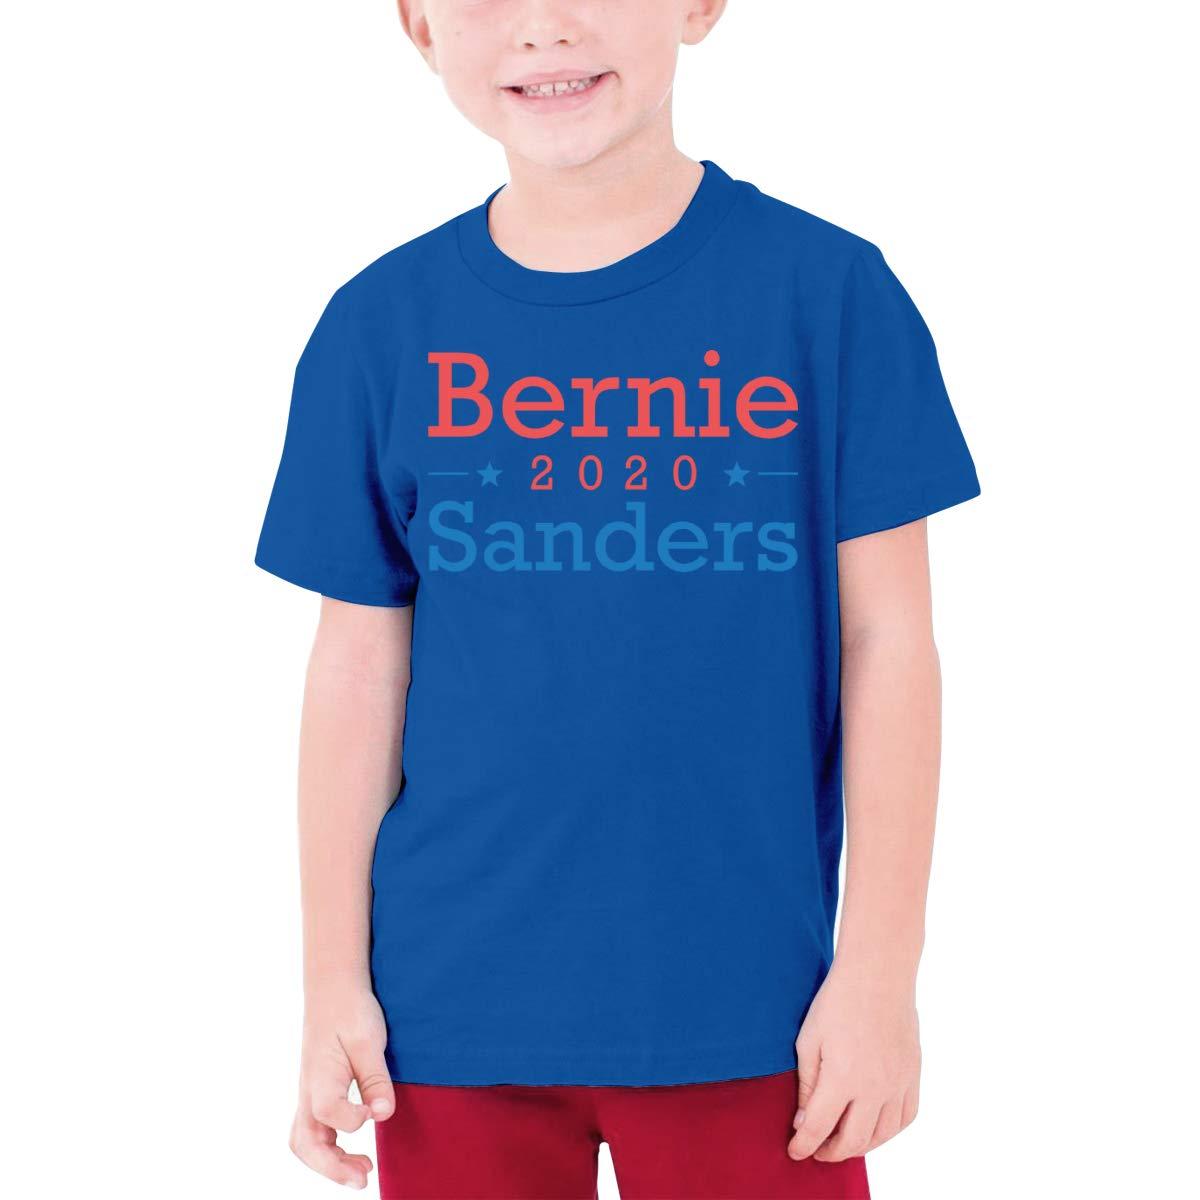 Fzjy Wnx Bernie Sanders 2020 Boys Short Sleeve T-Shirts